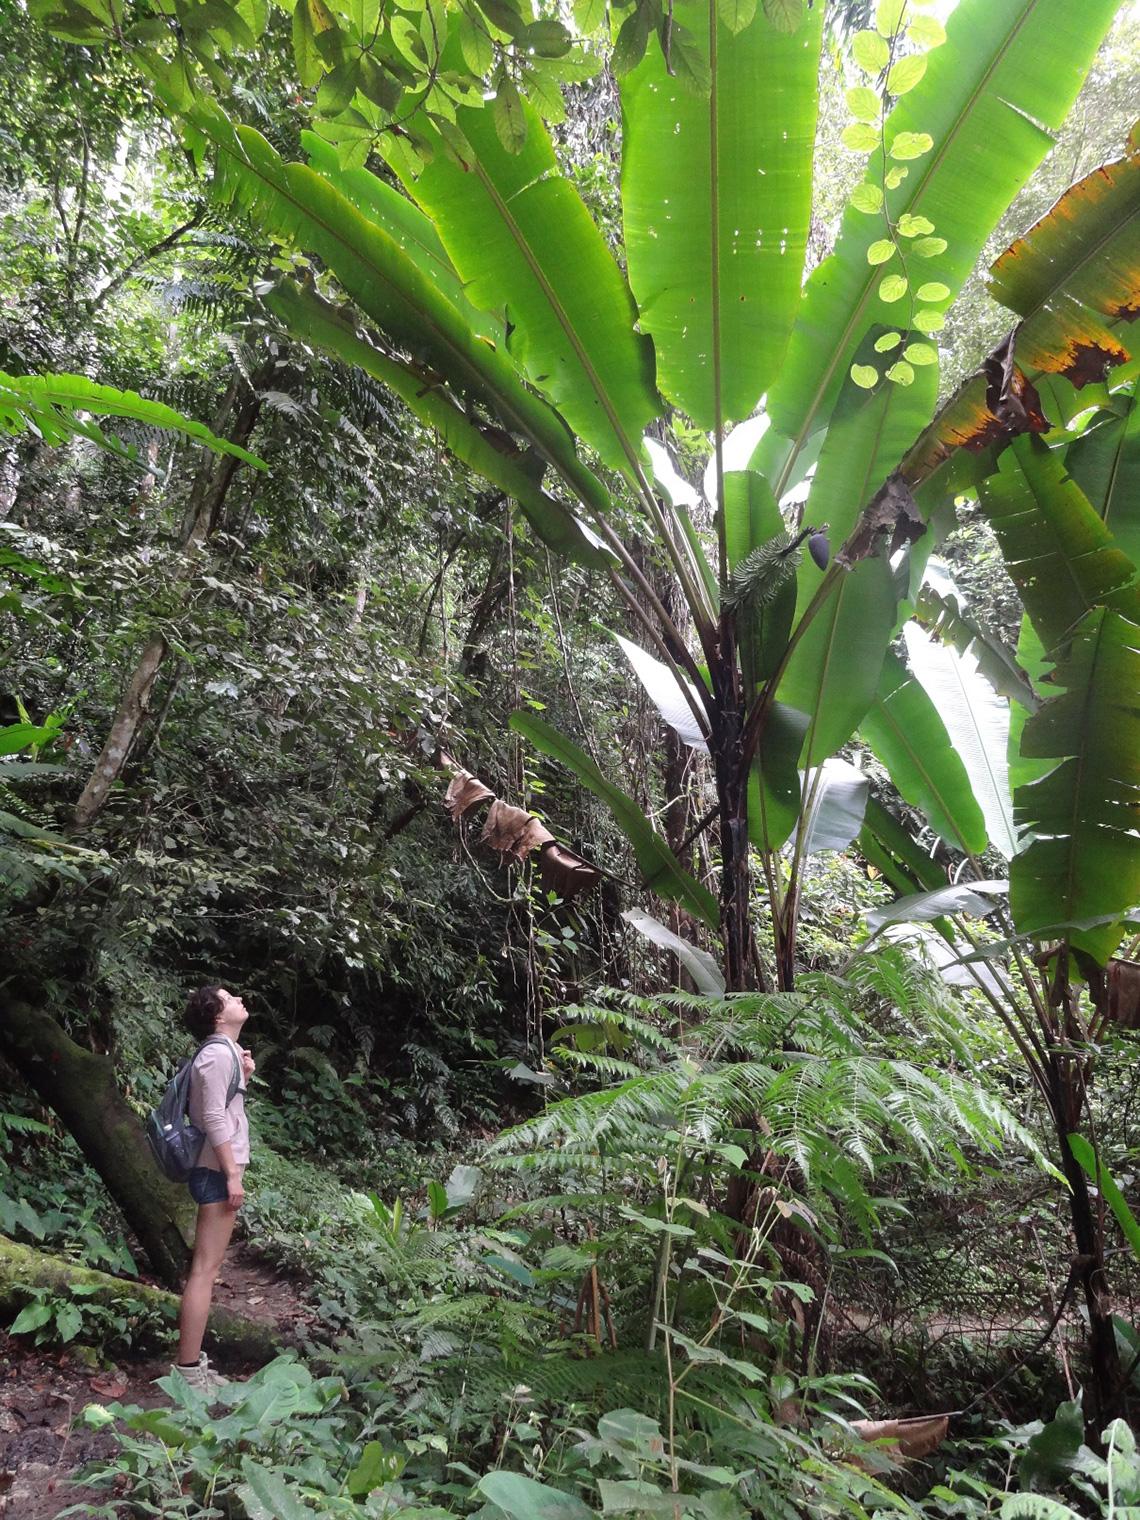 reisverslag-roan-jungle-bij-cameron-highlands